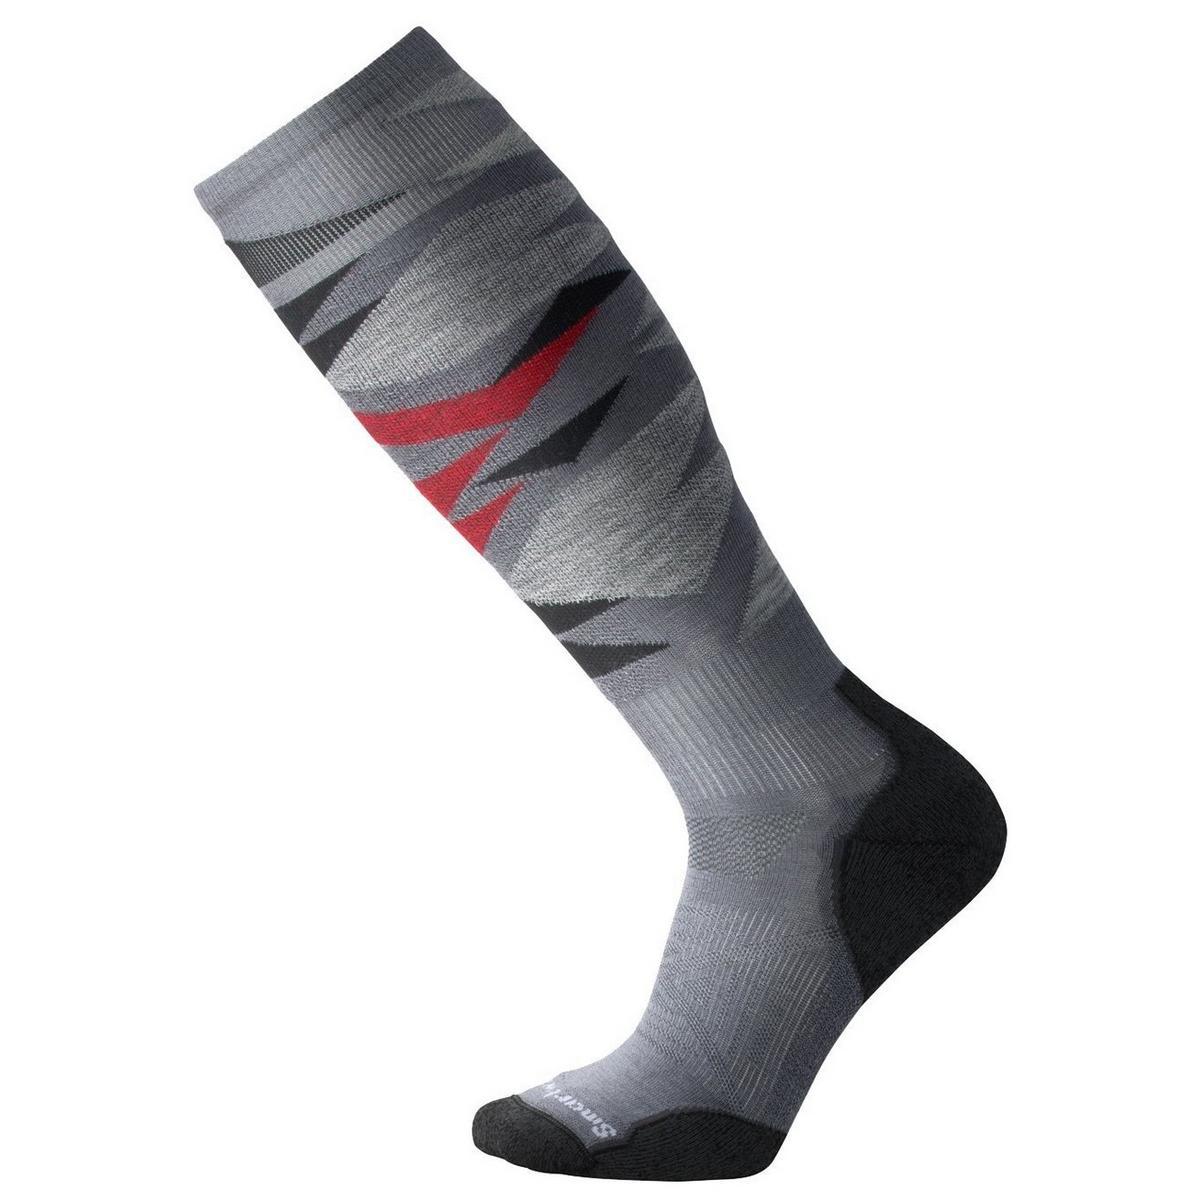 Smartwool Men's PHD Ski Light Pattern Sock